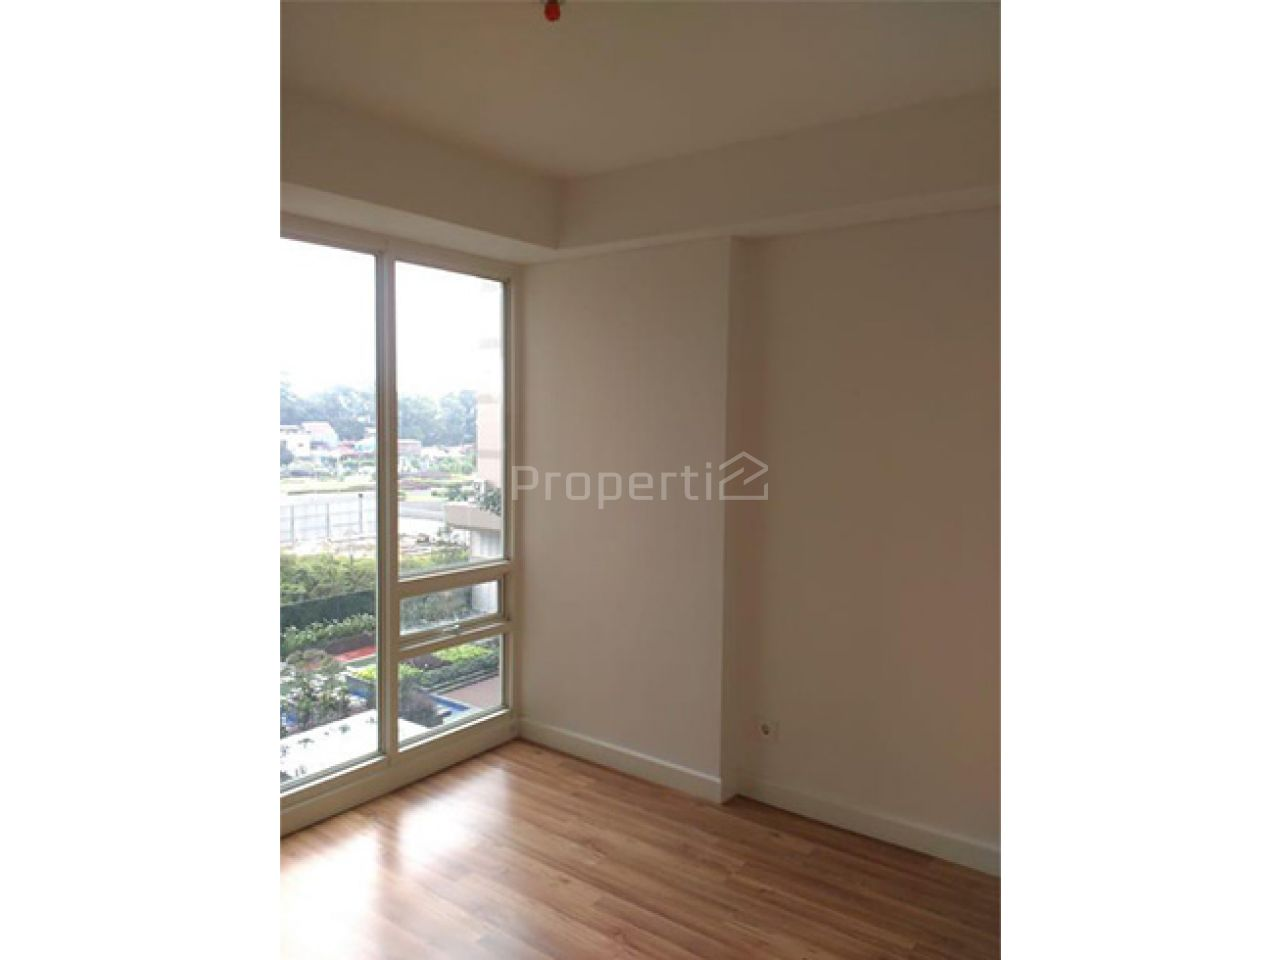 2BR Apartment Unit at Landmark Residence, 3th Floor, Jawa Barat